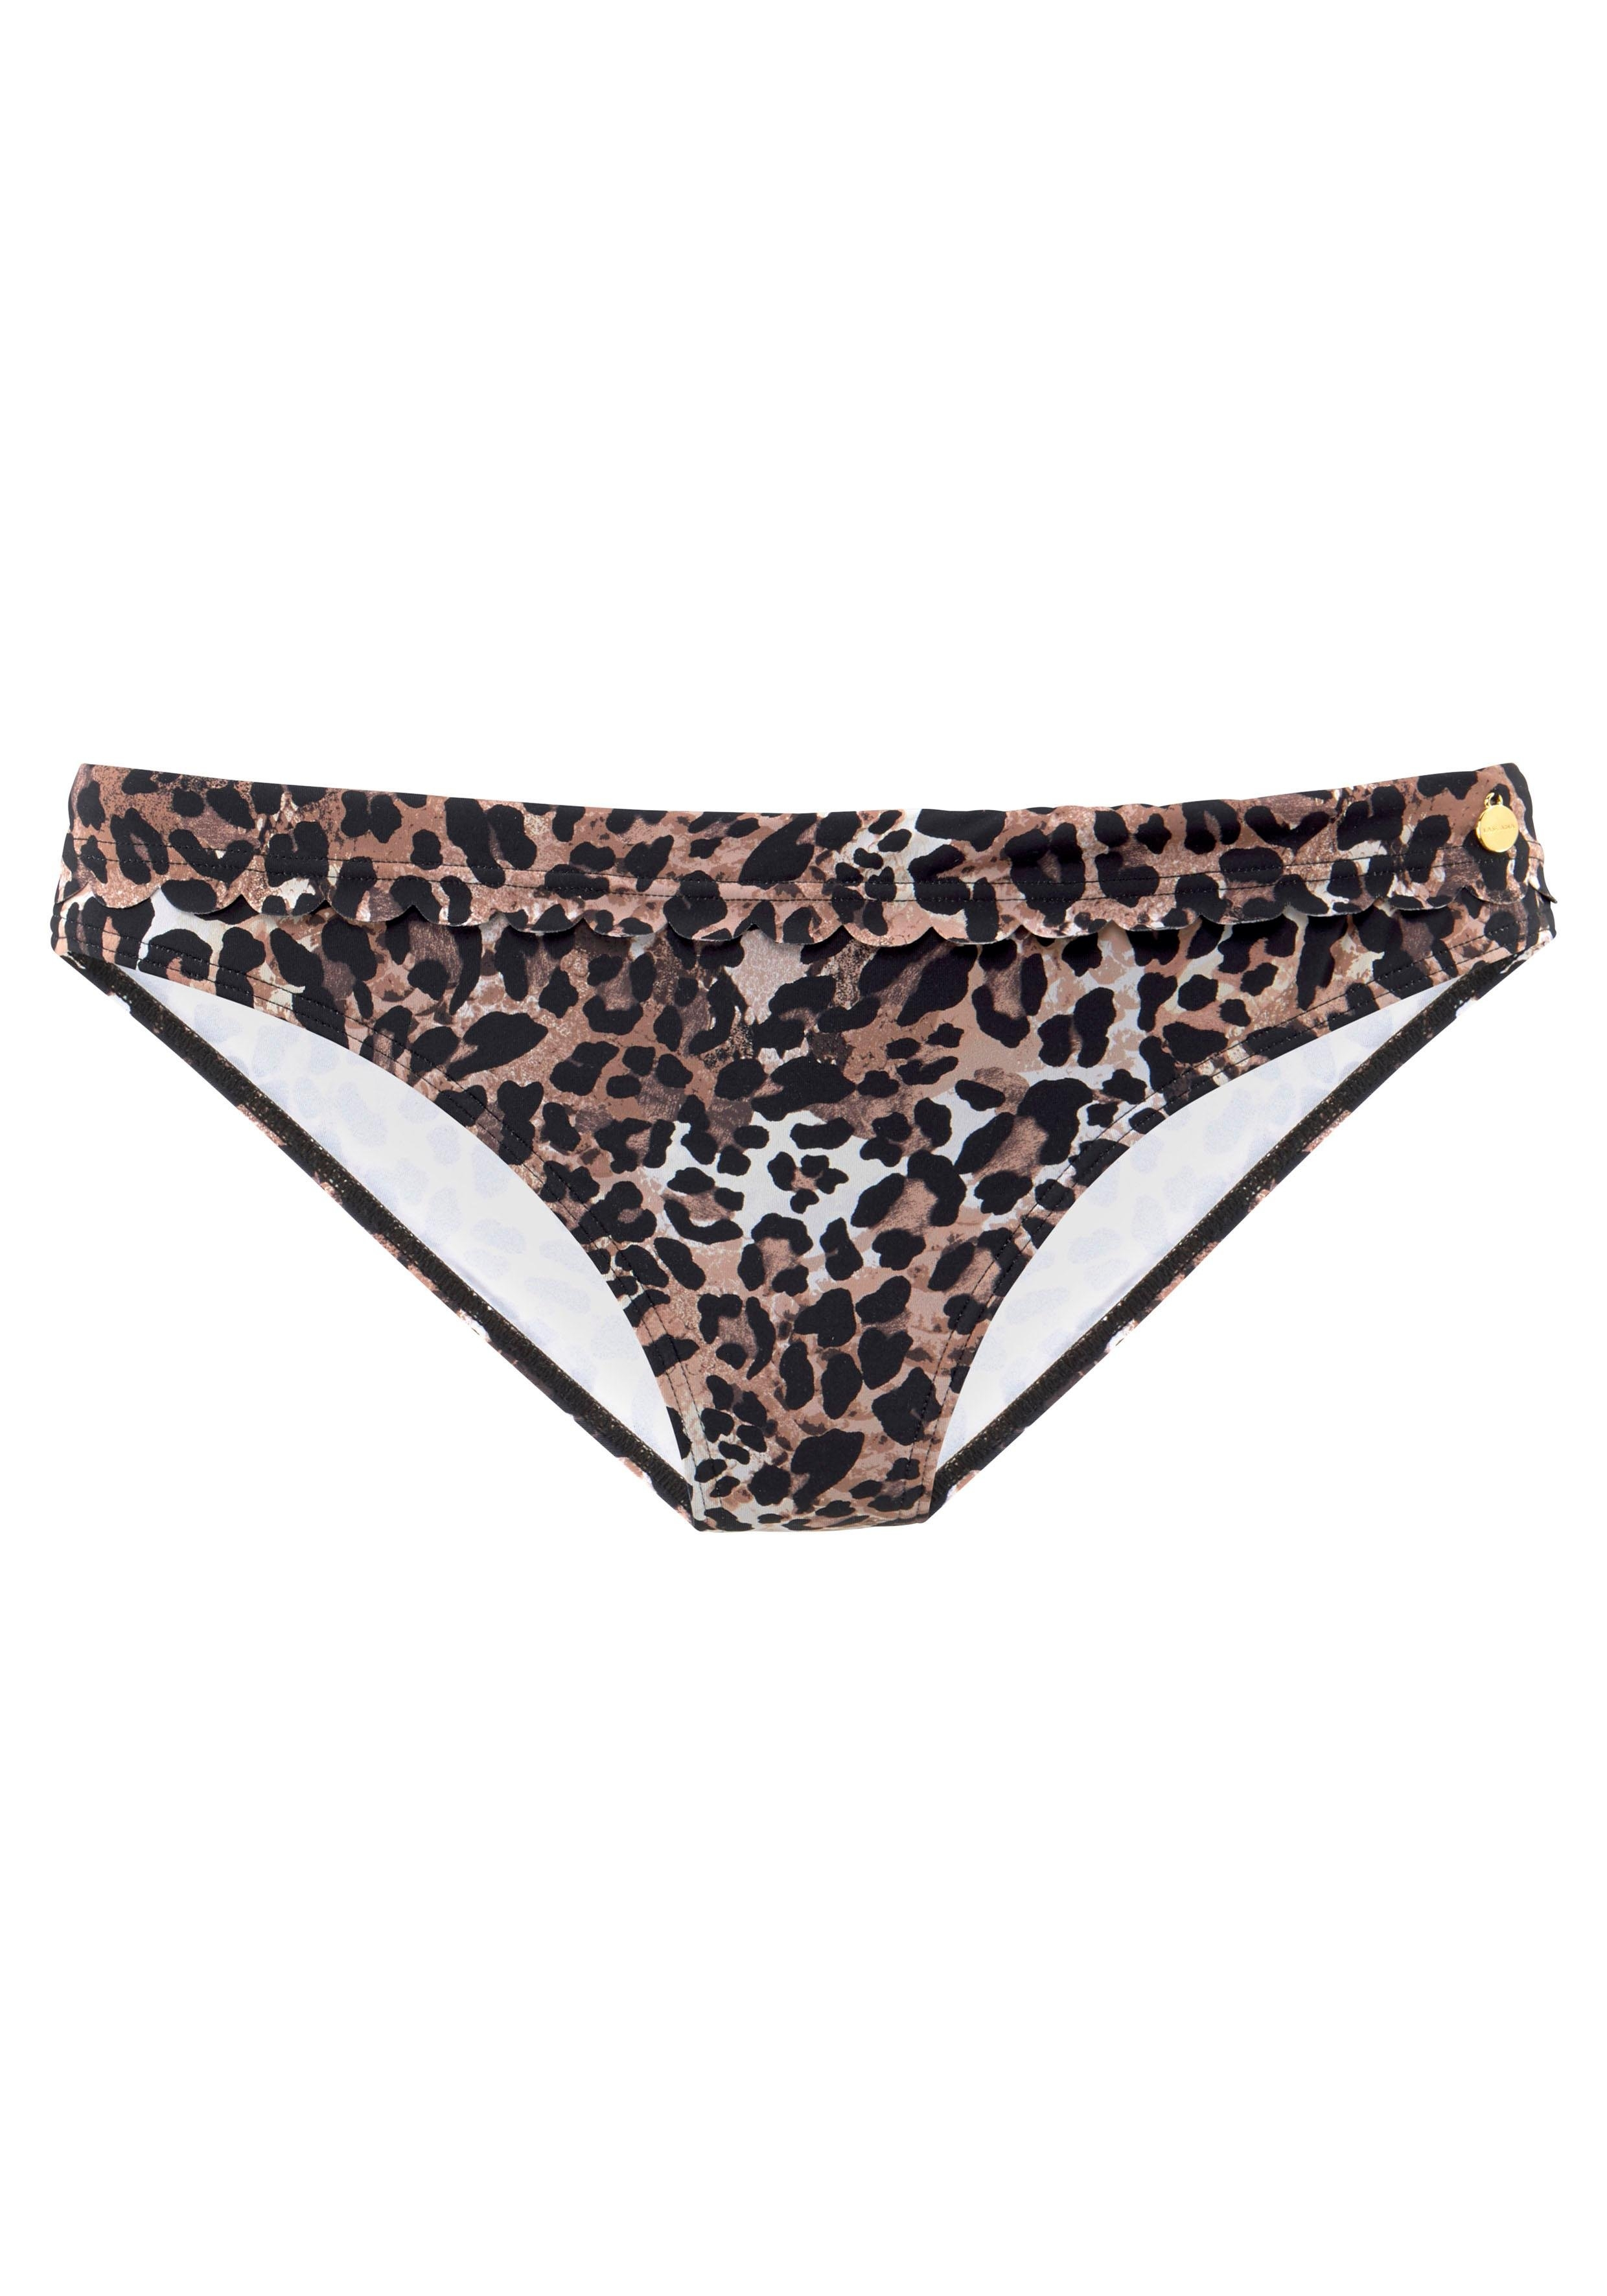 Lascana bikinibroekje Lexa met omslagband en schulprandjes bij Lascana online kopen